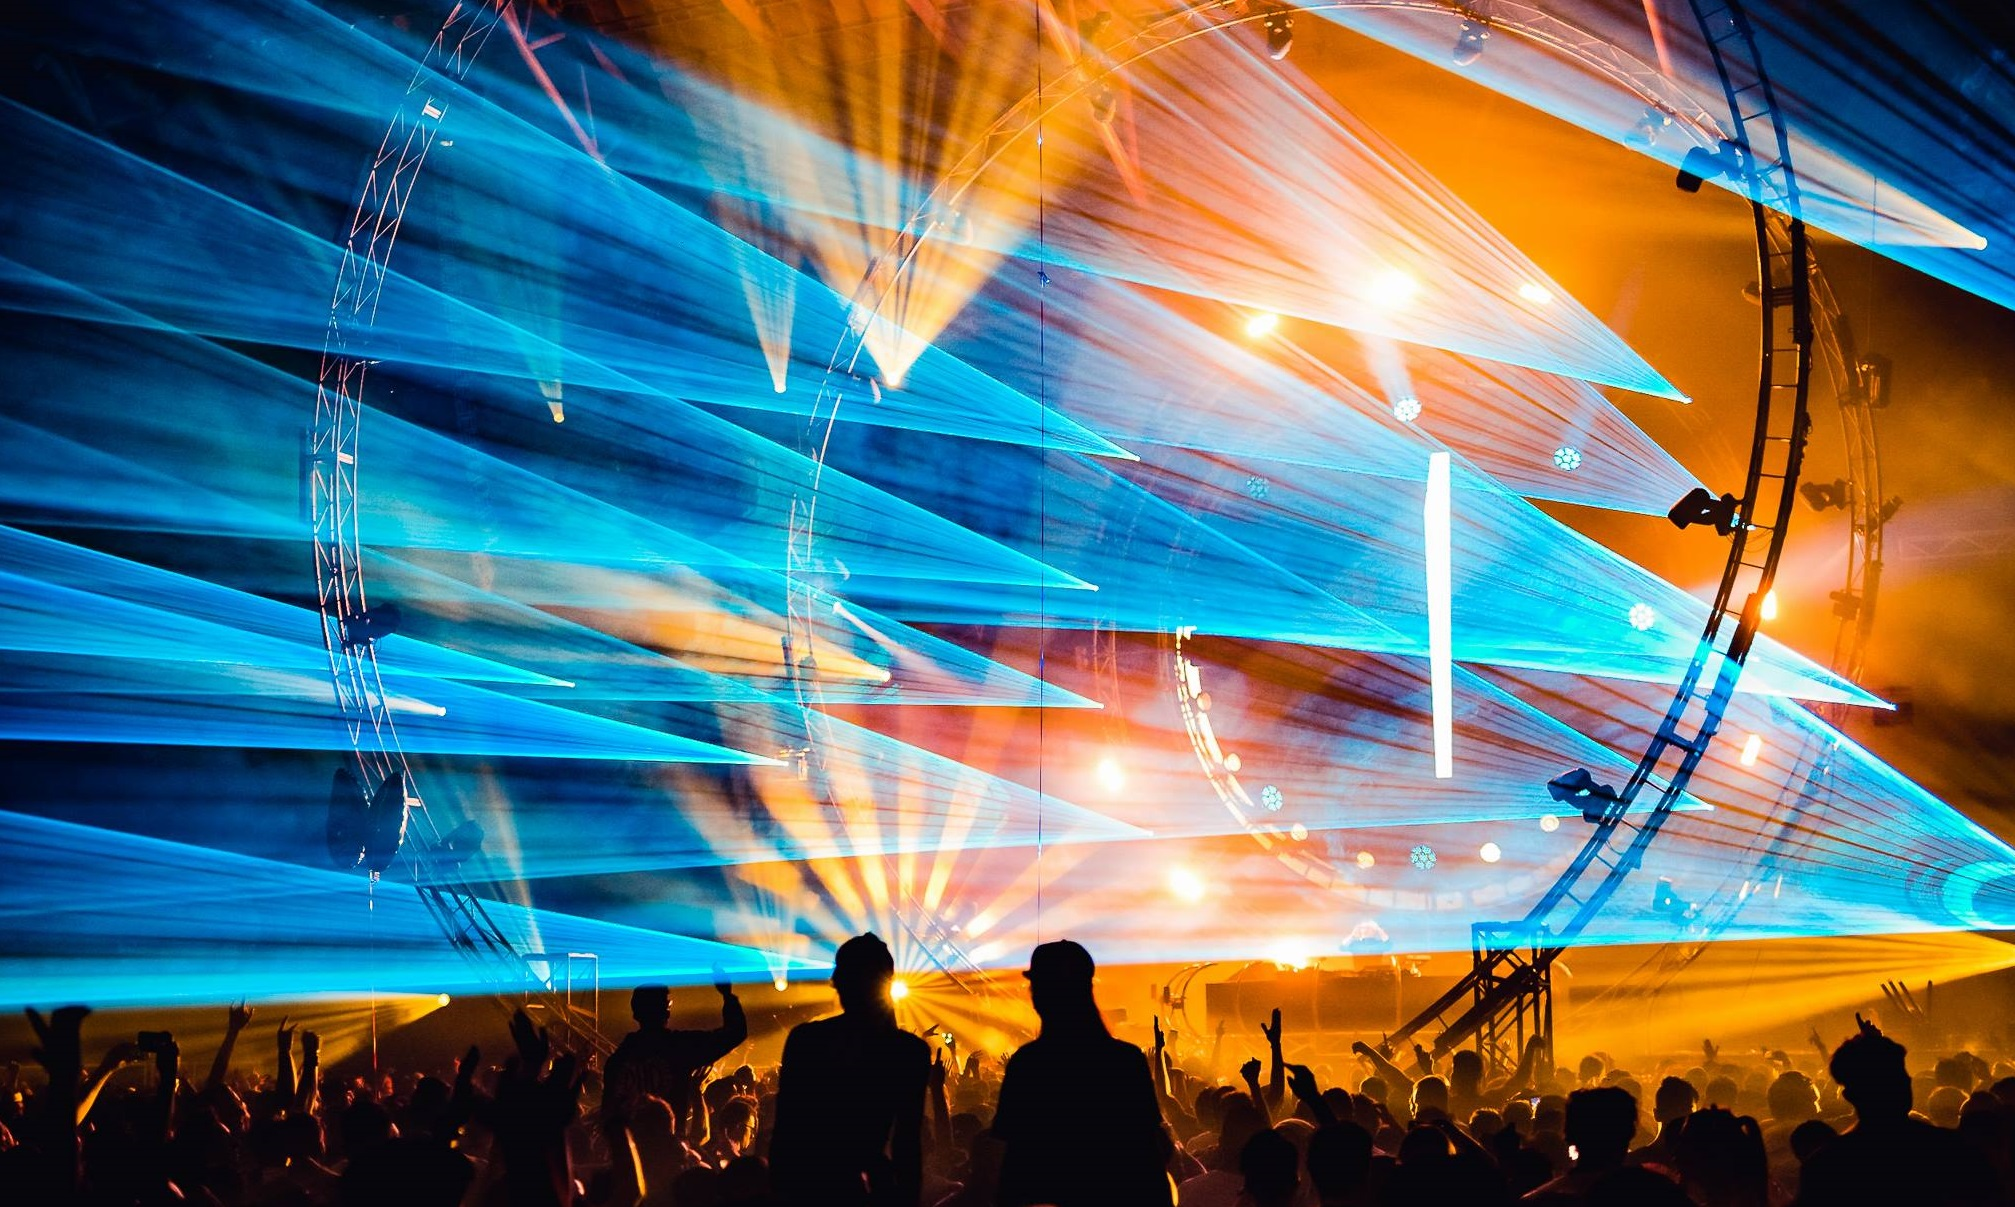 Dreamstate Melbourne 2016 lasers